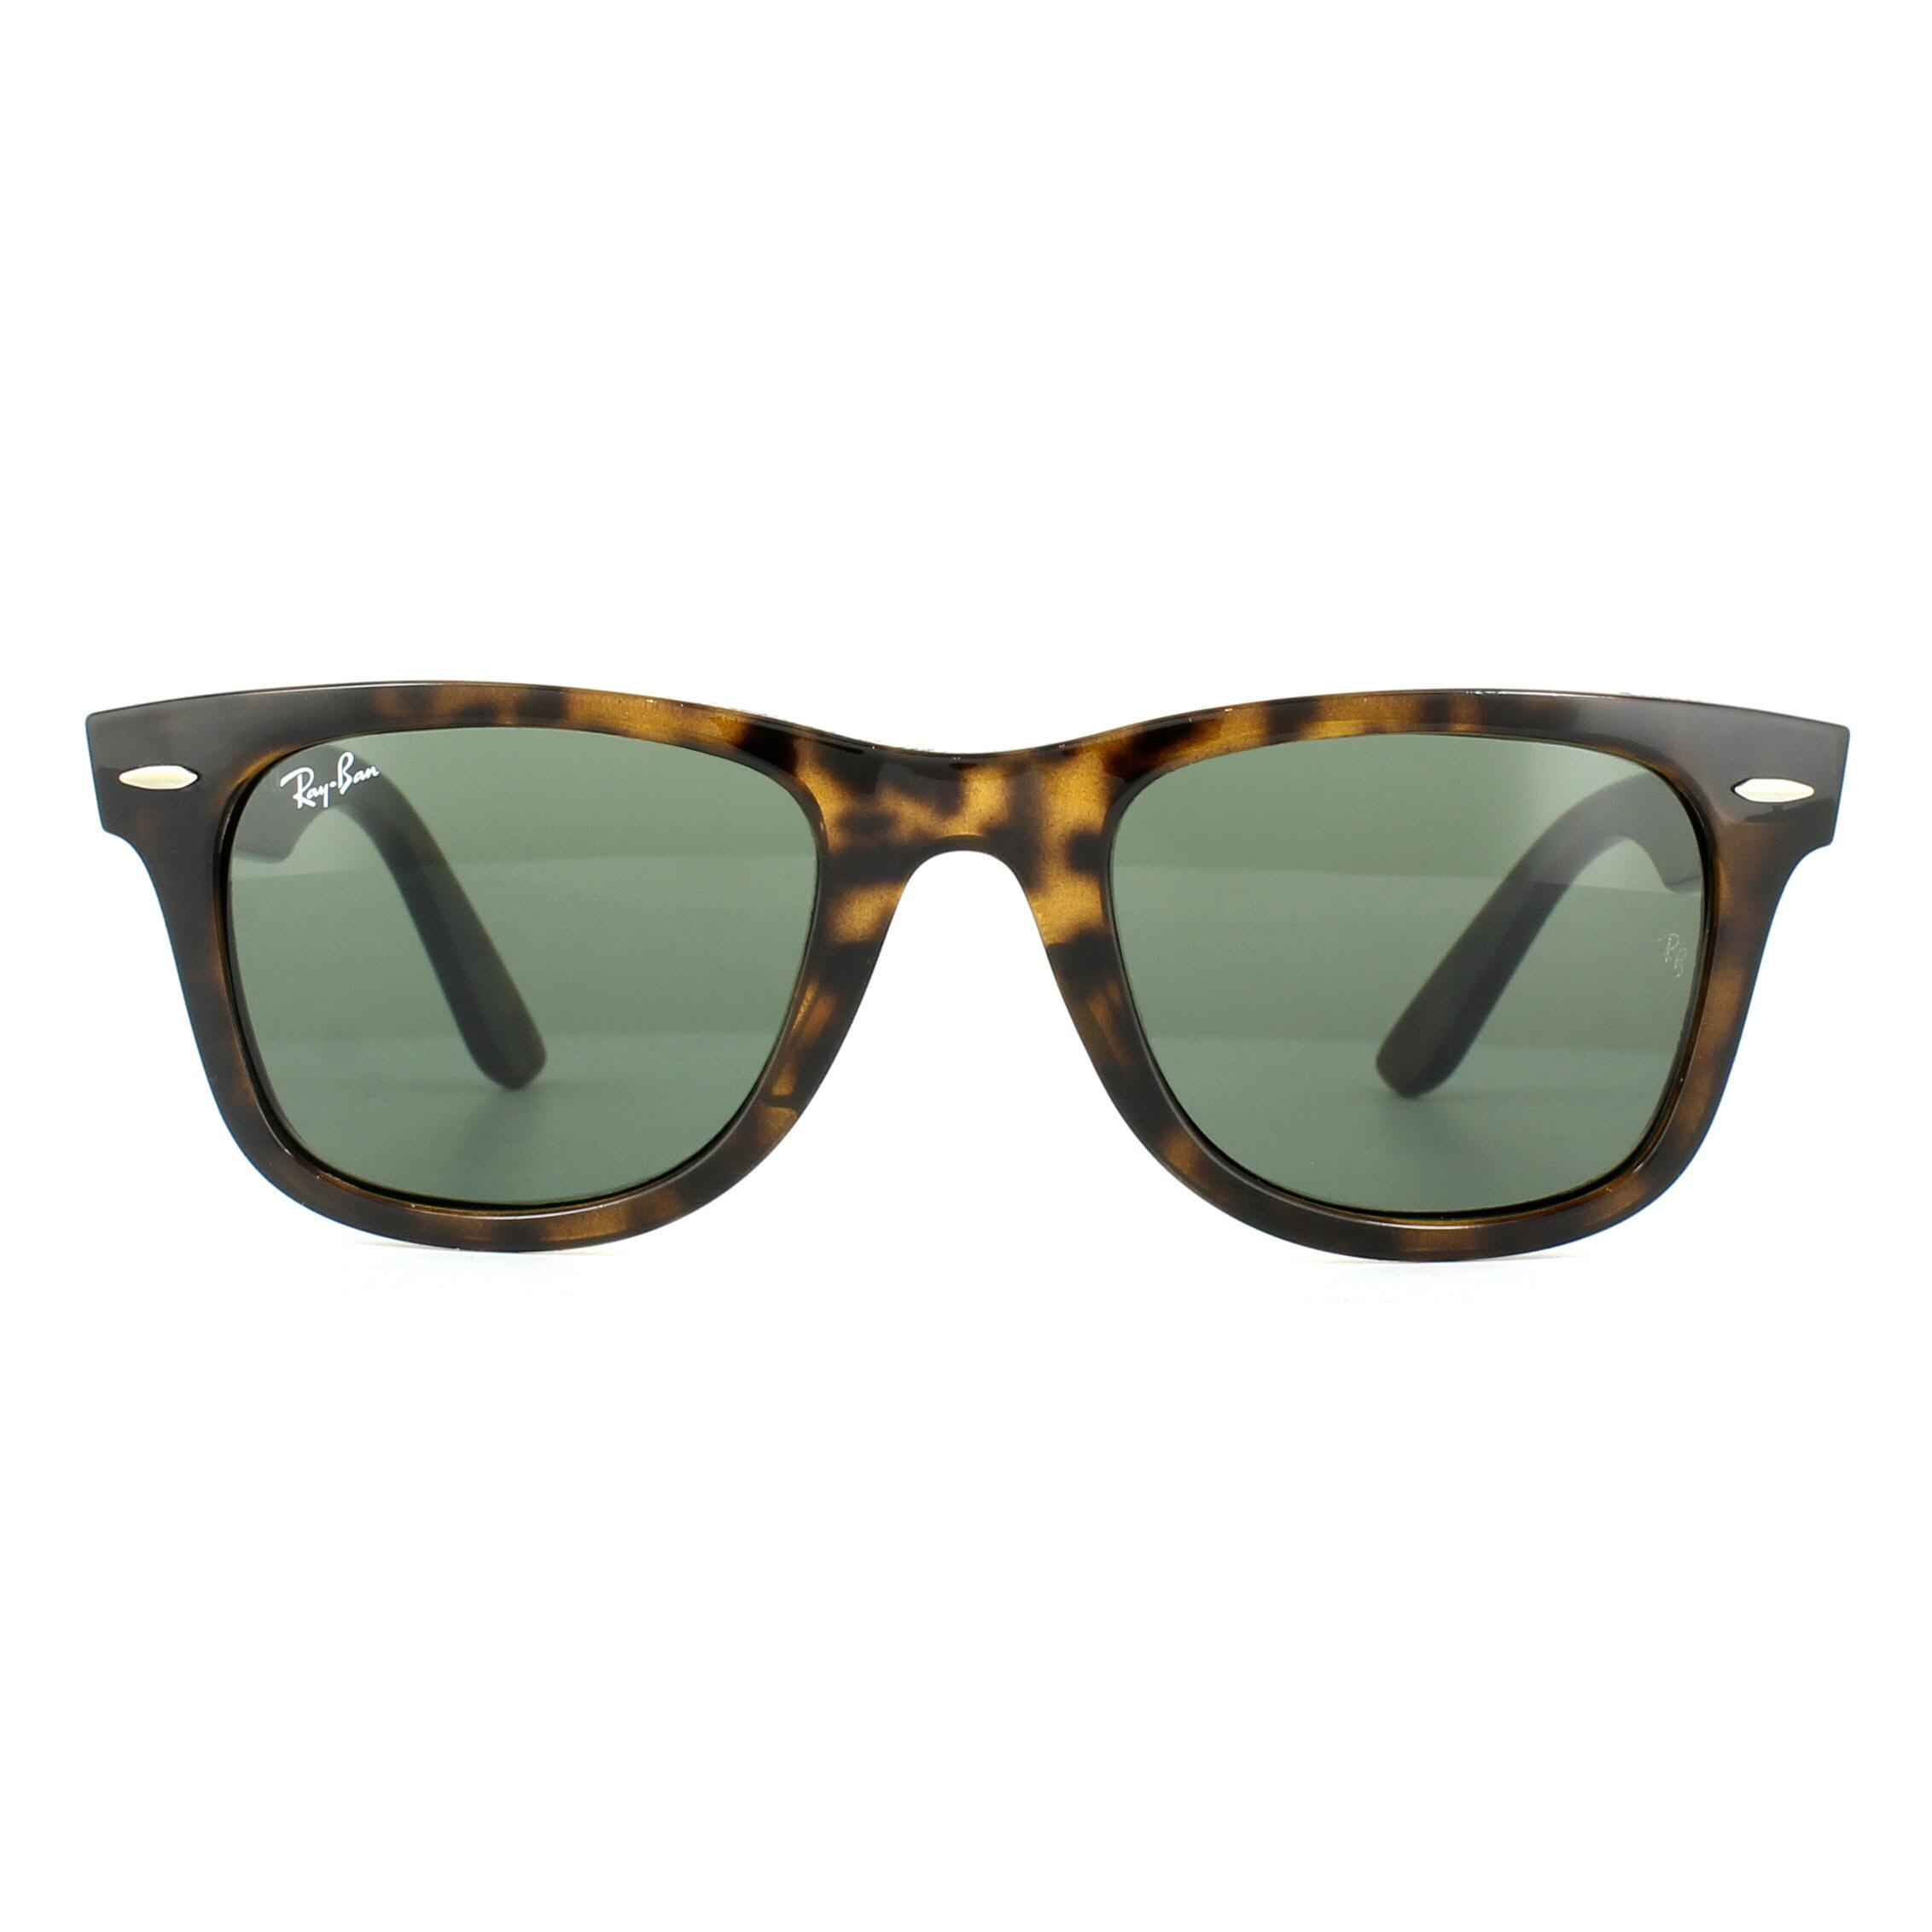 Cheap Ray Ban Wayfarer Ease Rb4340 Sunglasses Discounted